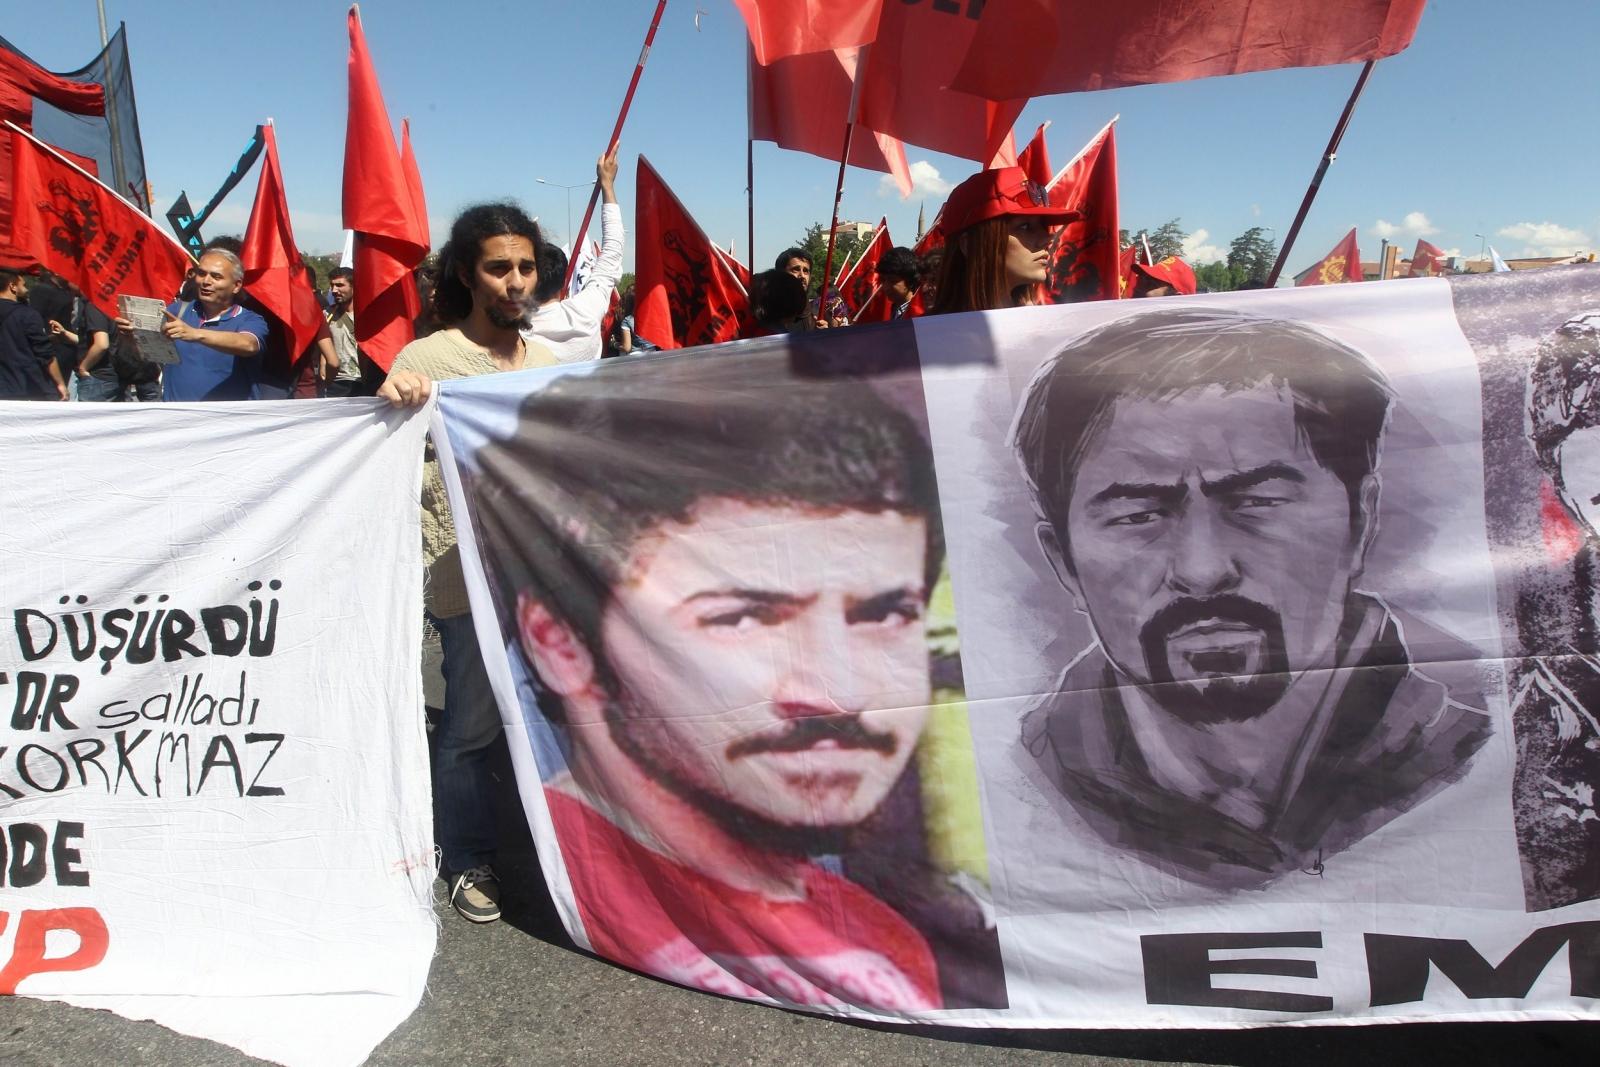 People take part in a demonstration in Kayseri